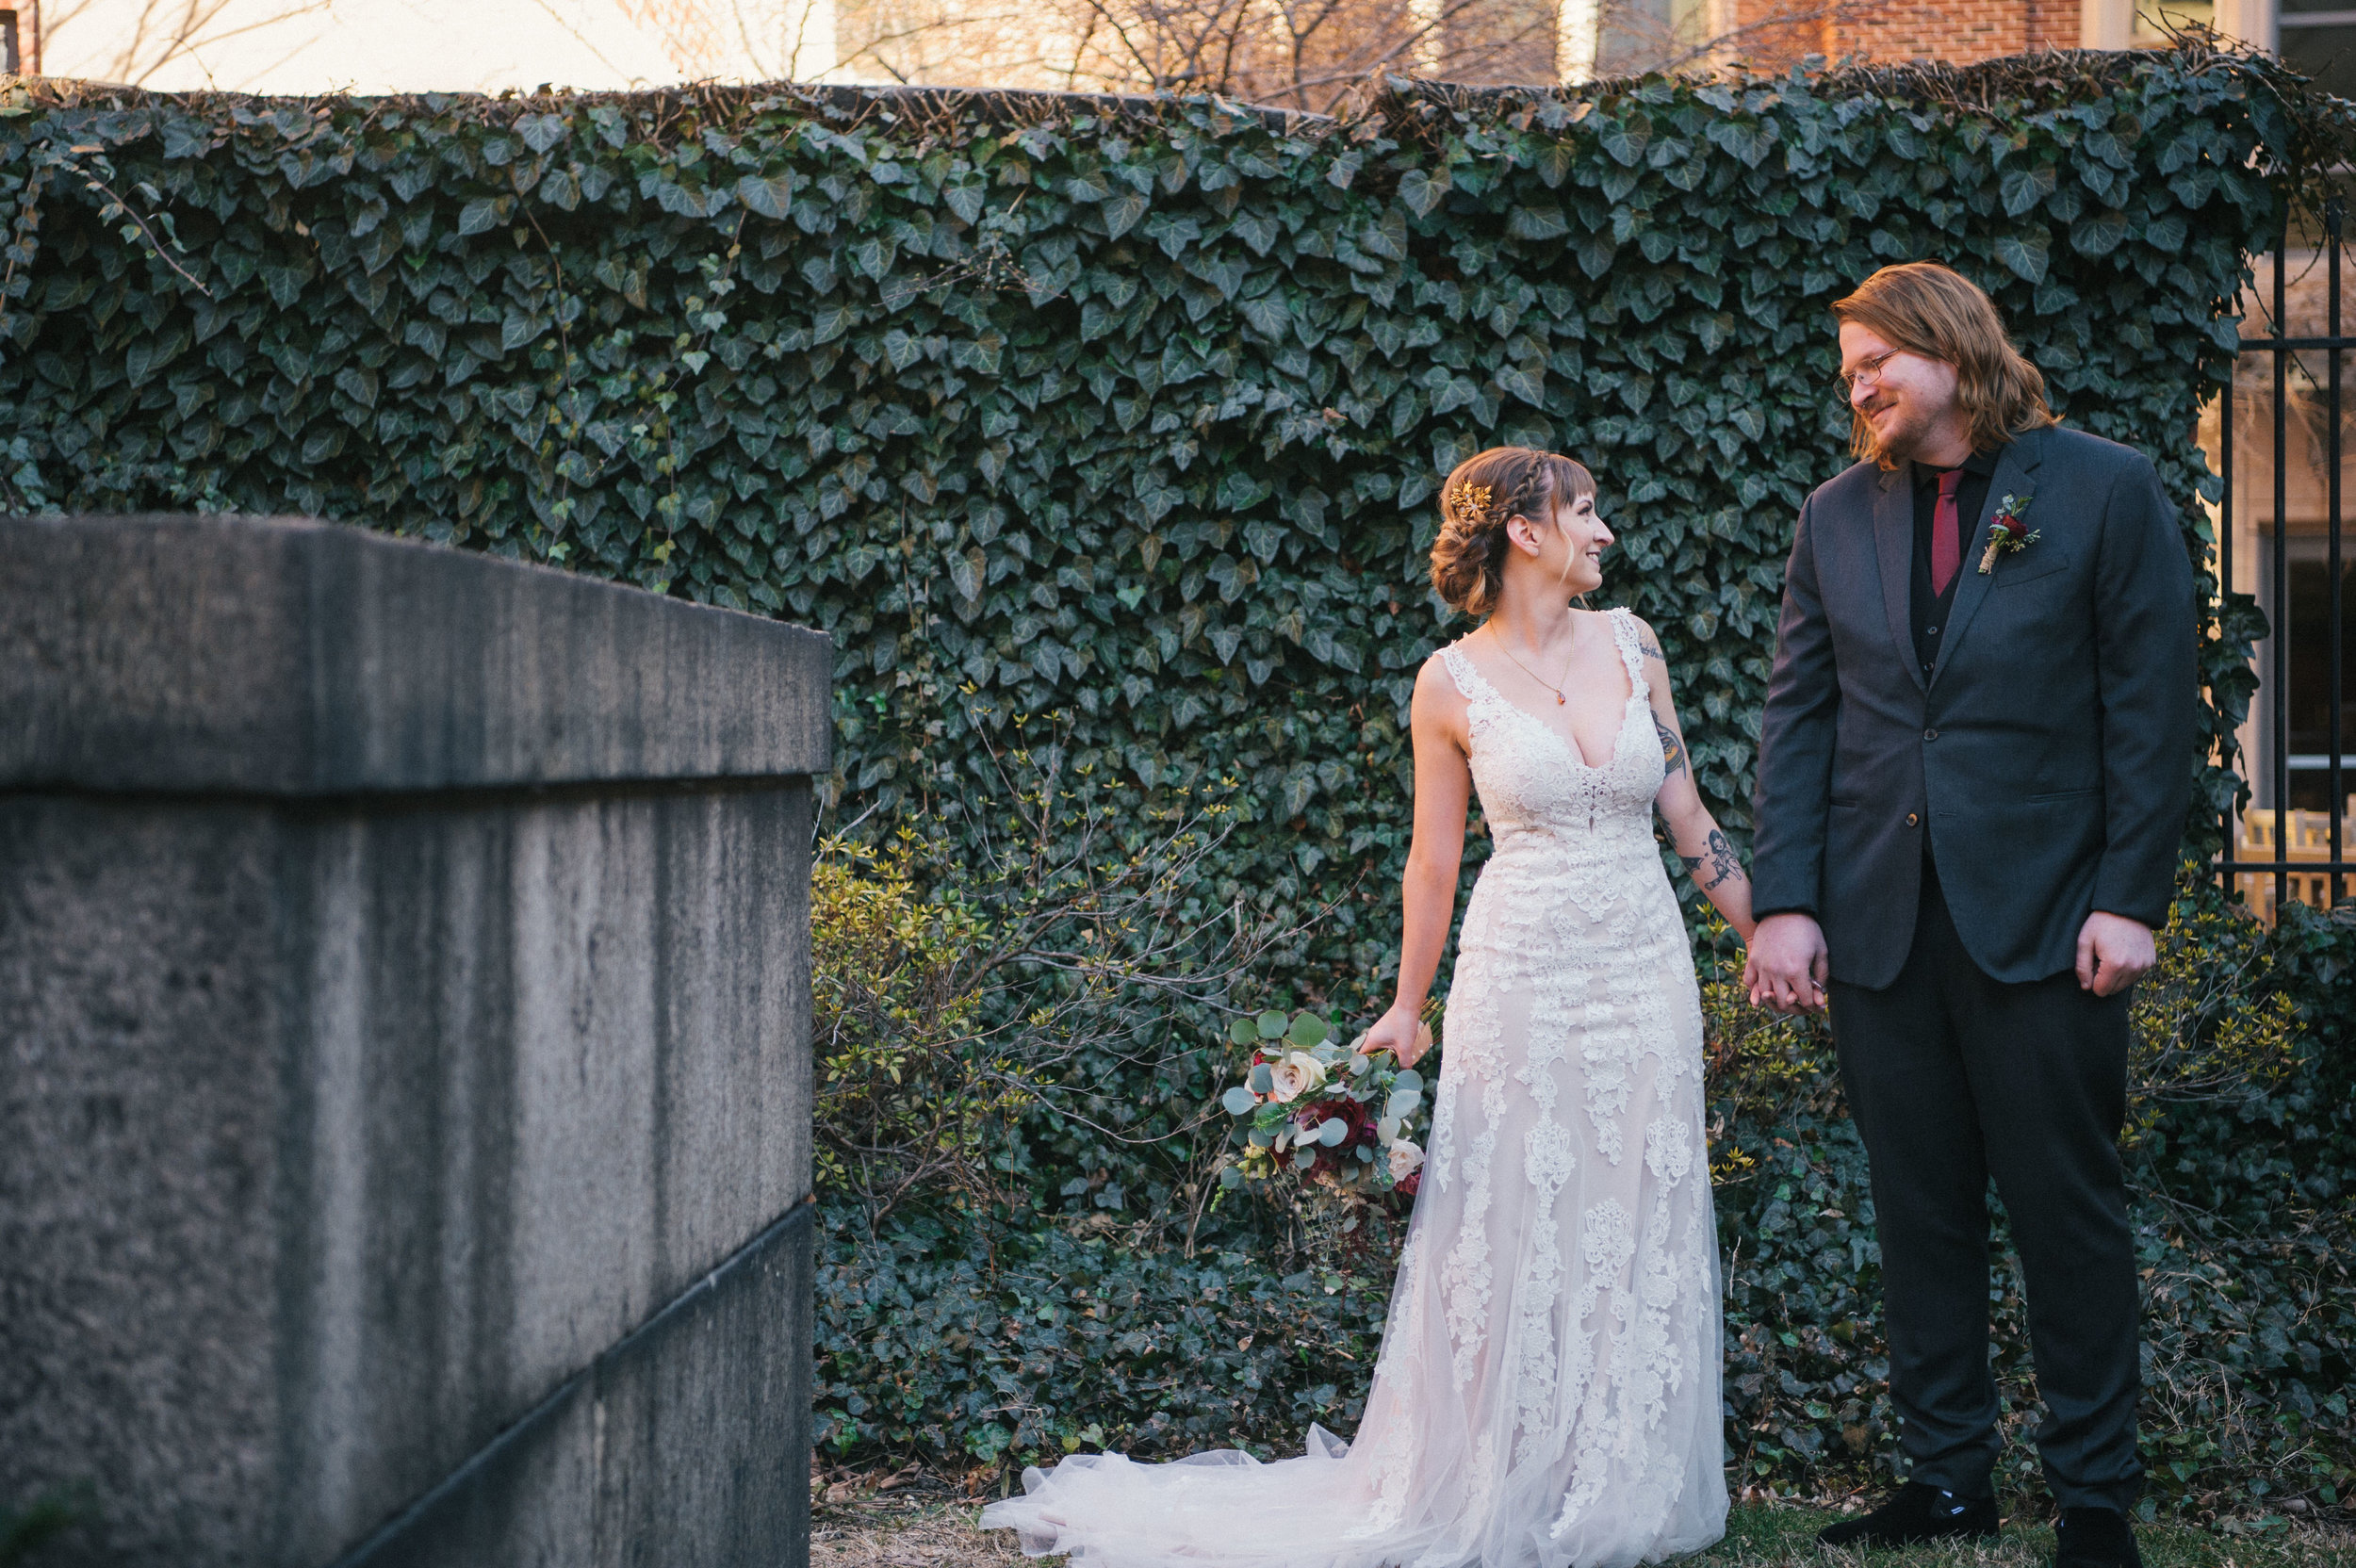 Amber and Kyles Wedding 22.jpg